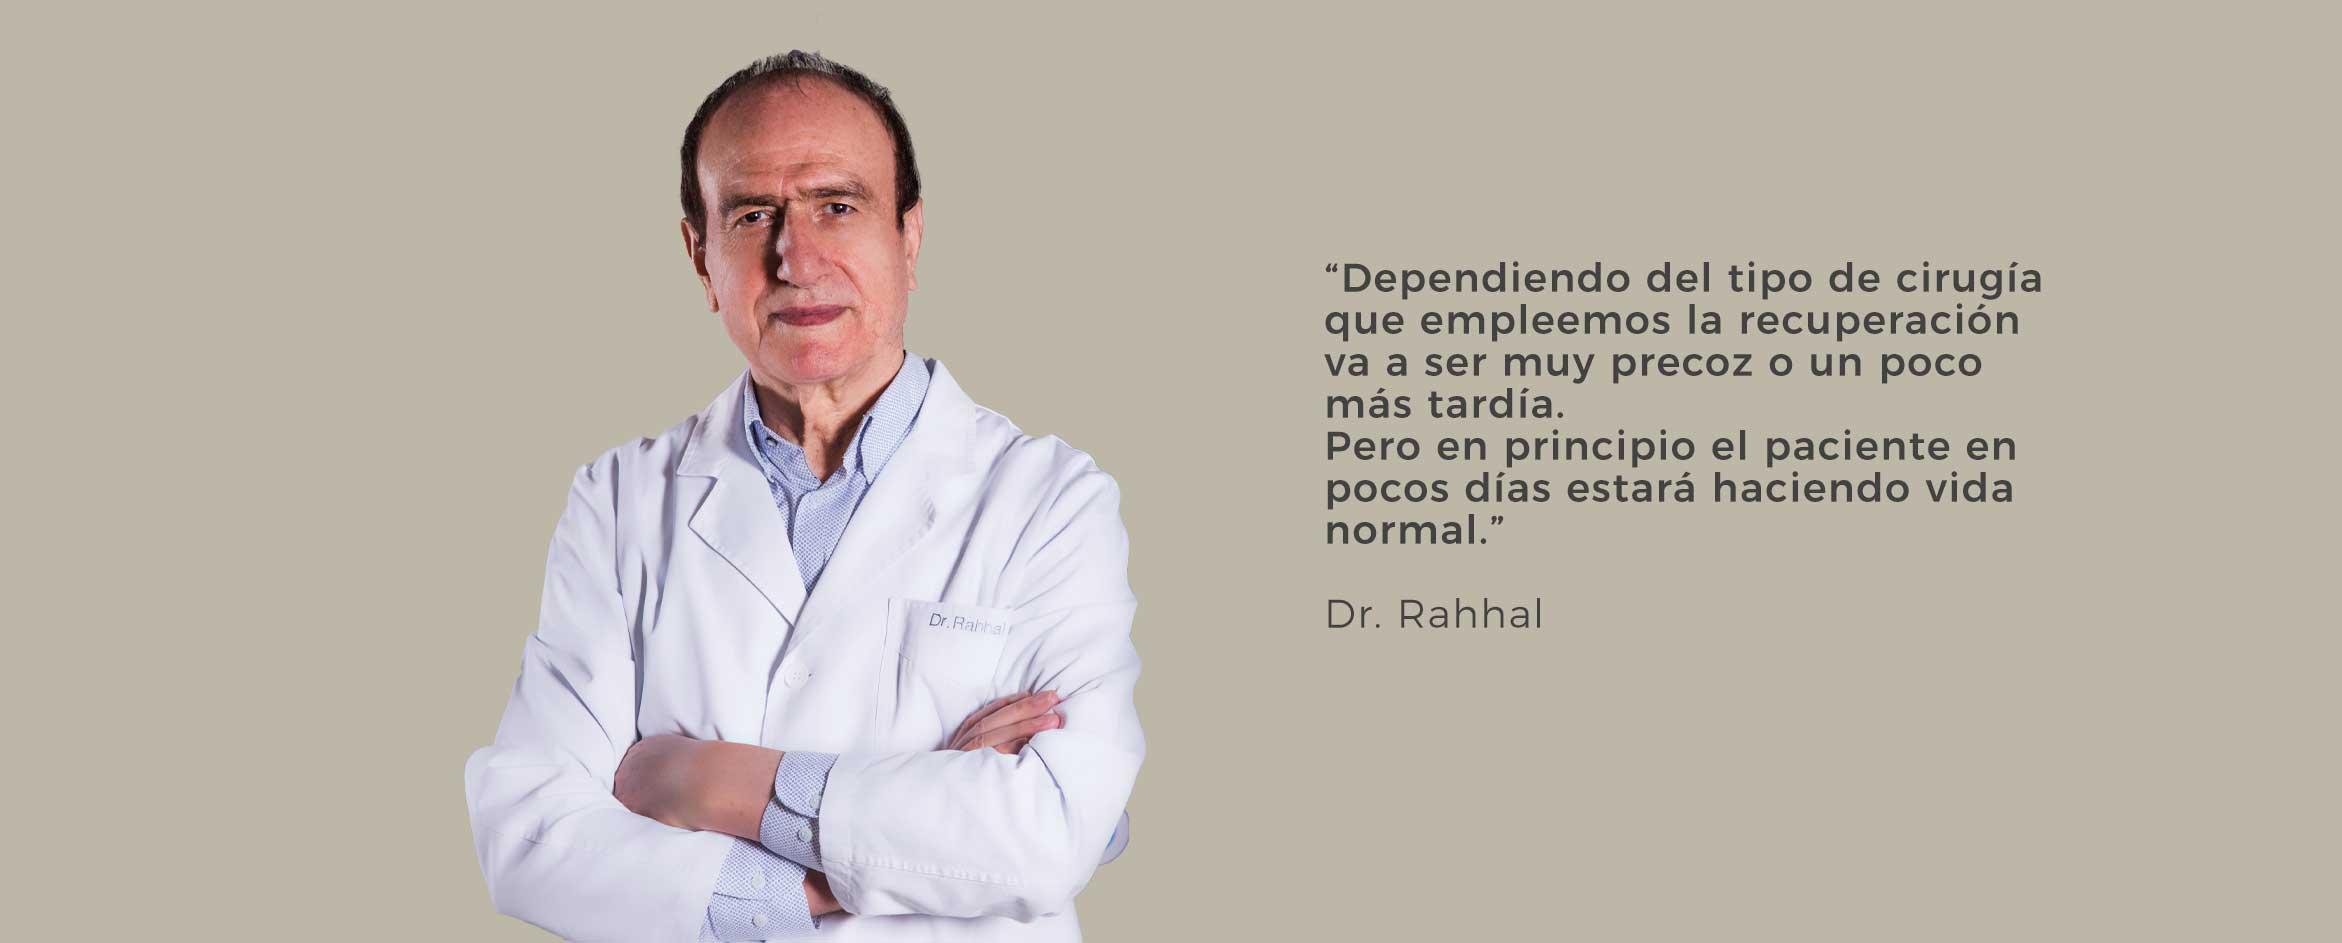 opinion-operacion-miopia-doctor-rahhal